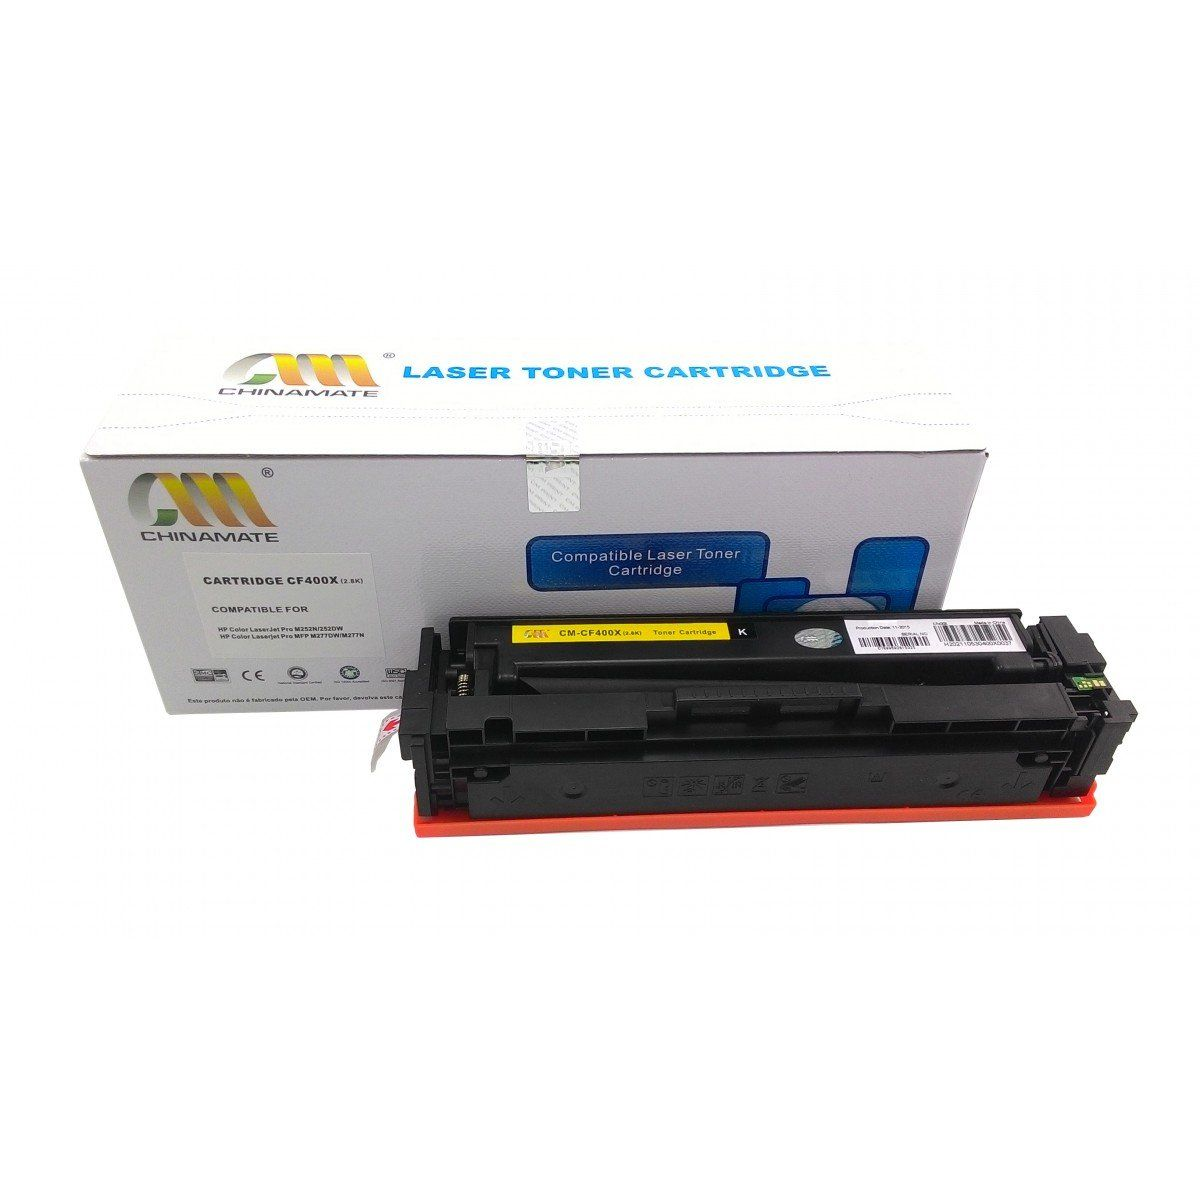 TONER HP CF400X BK 2.8K - (M252DW/M274N/M277DW) - CHINAMATE